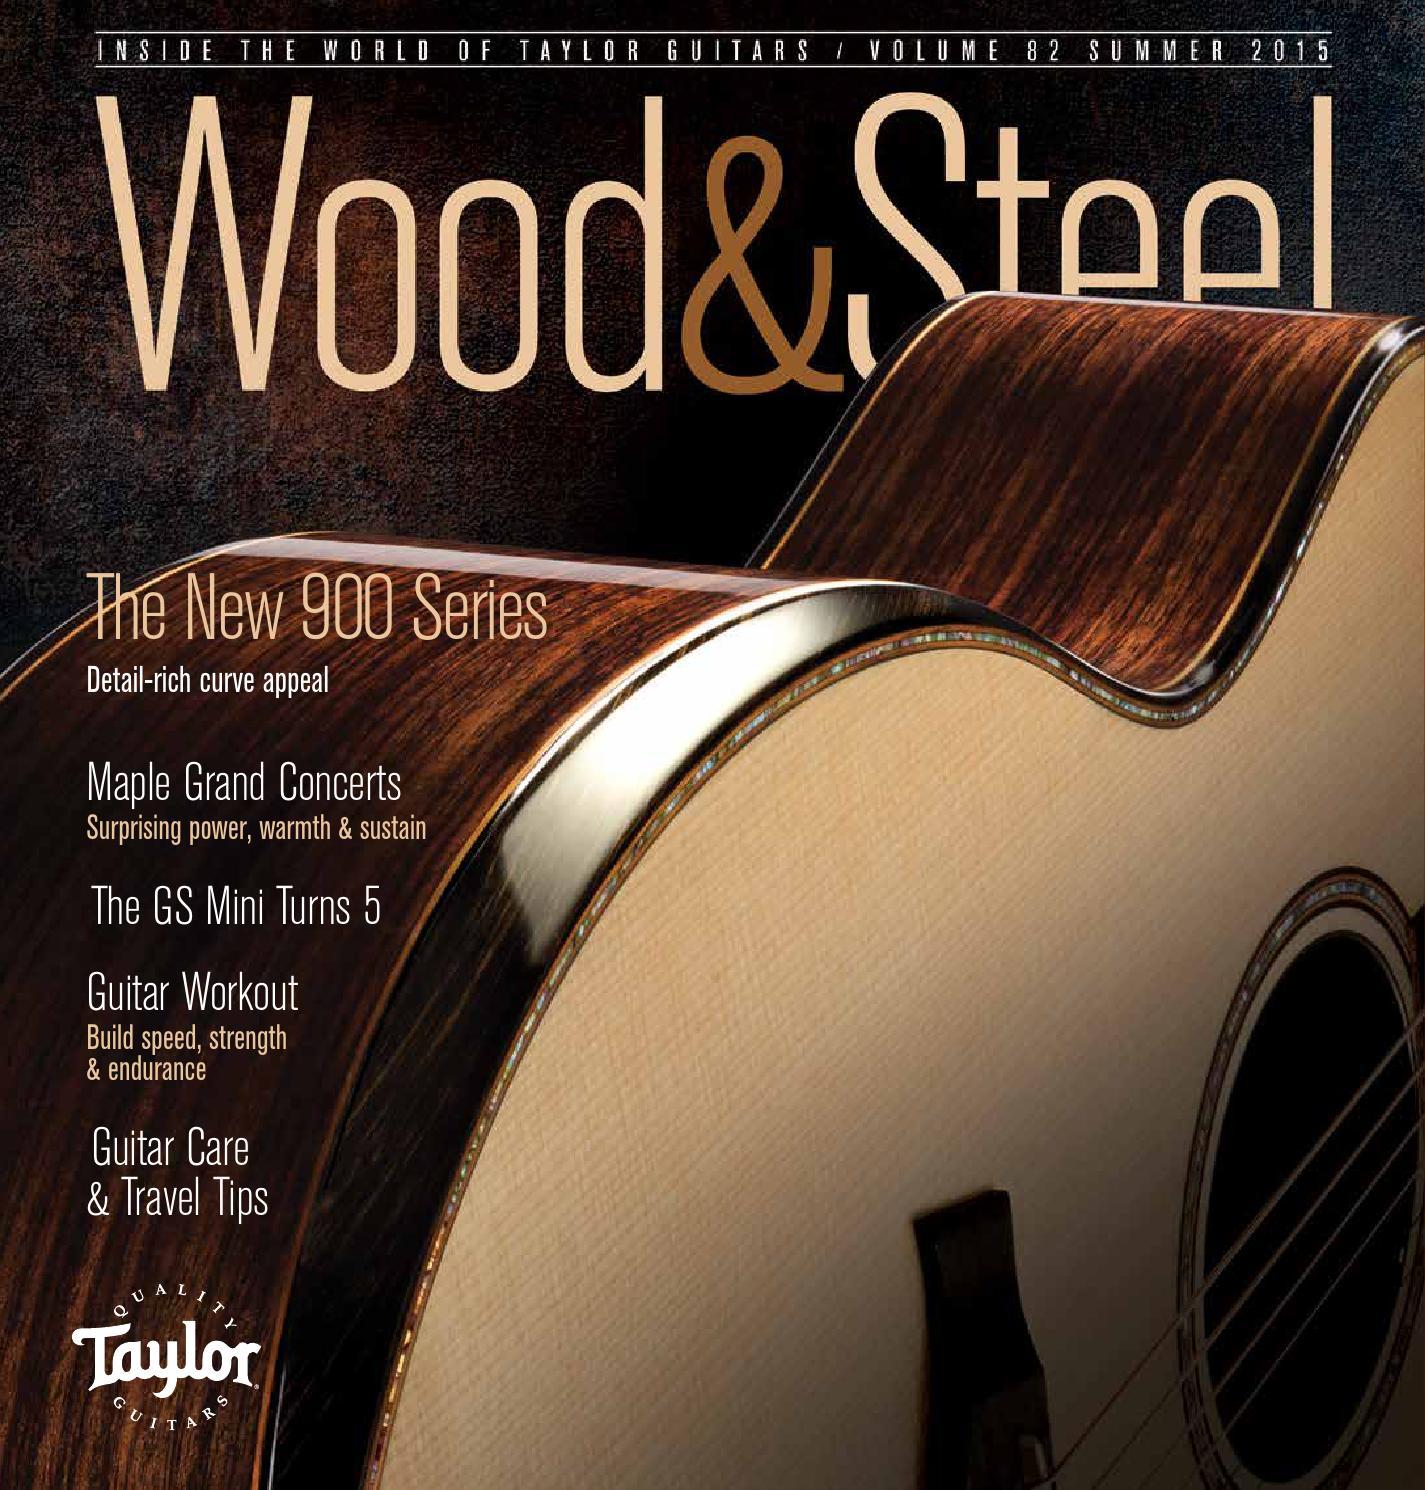 Wood Steel Volume 82 Summer 2015 By 1093bb Issuu